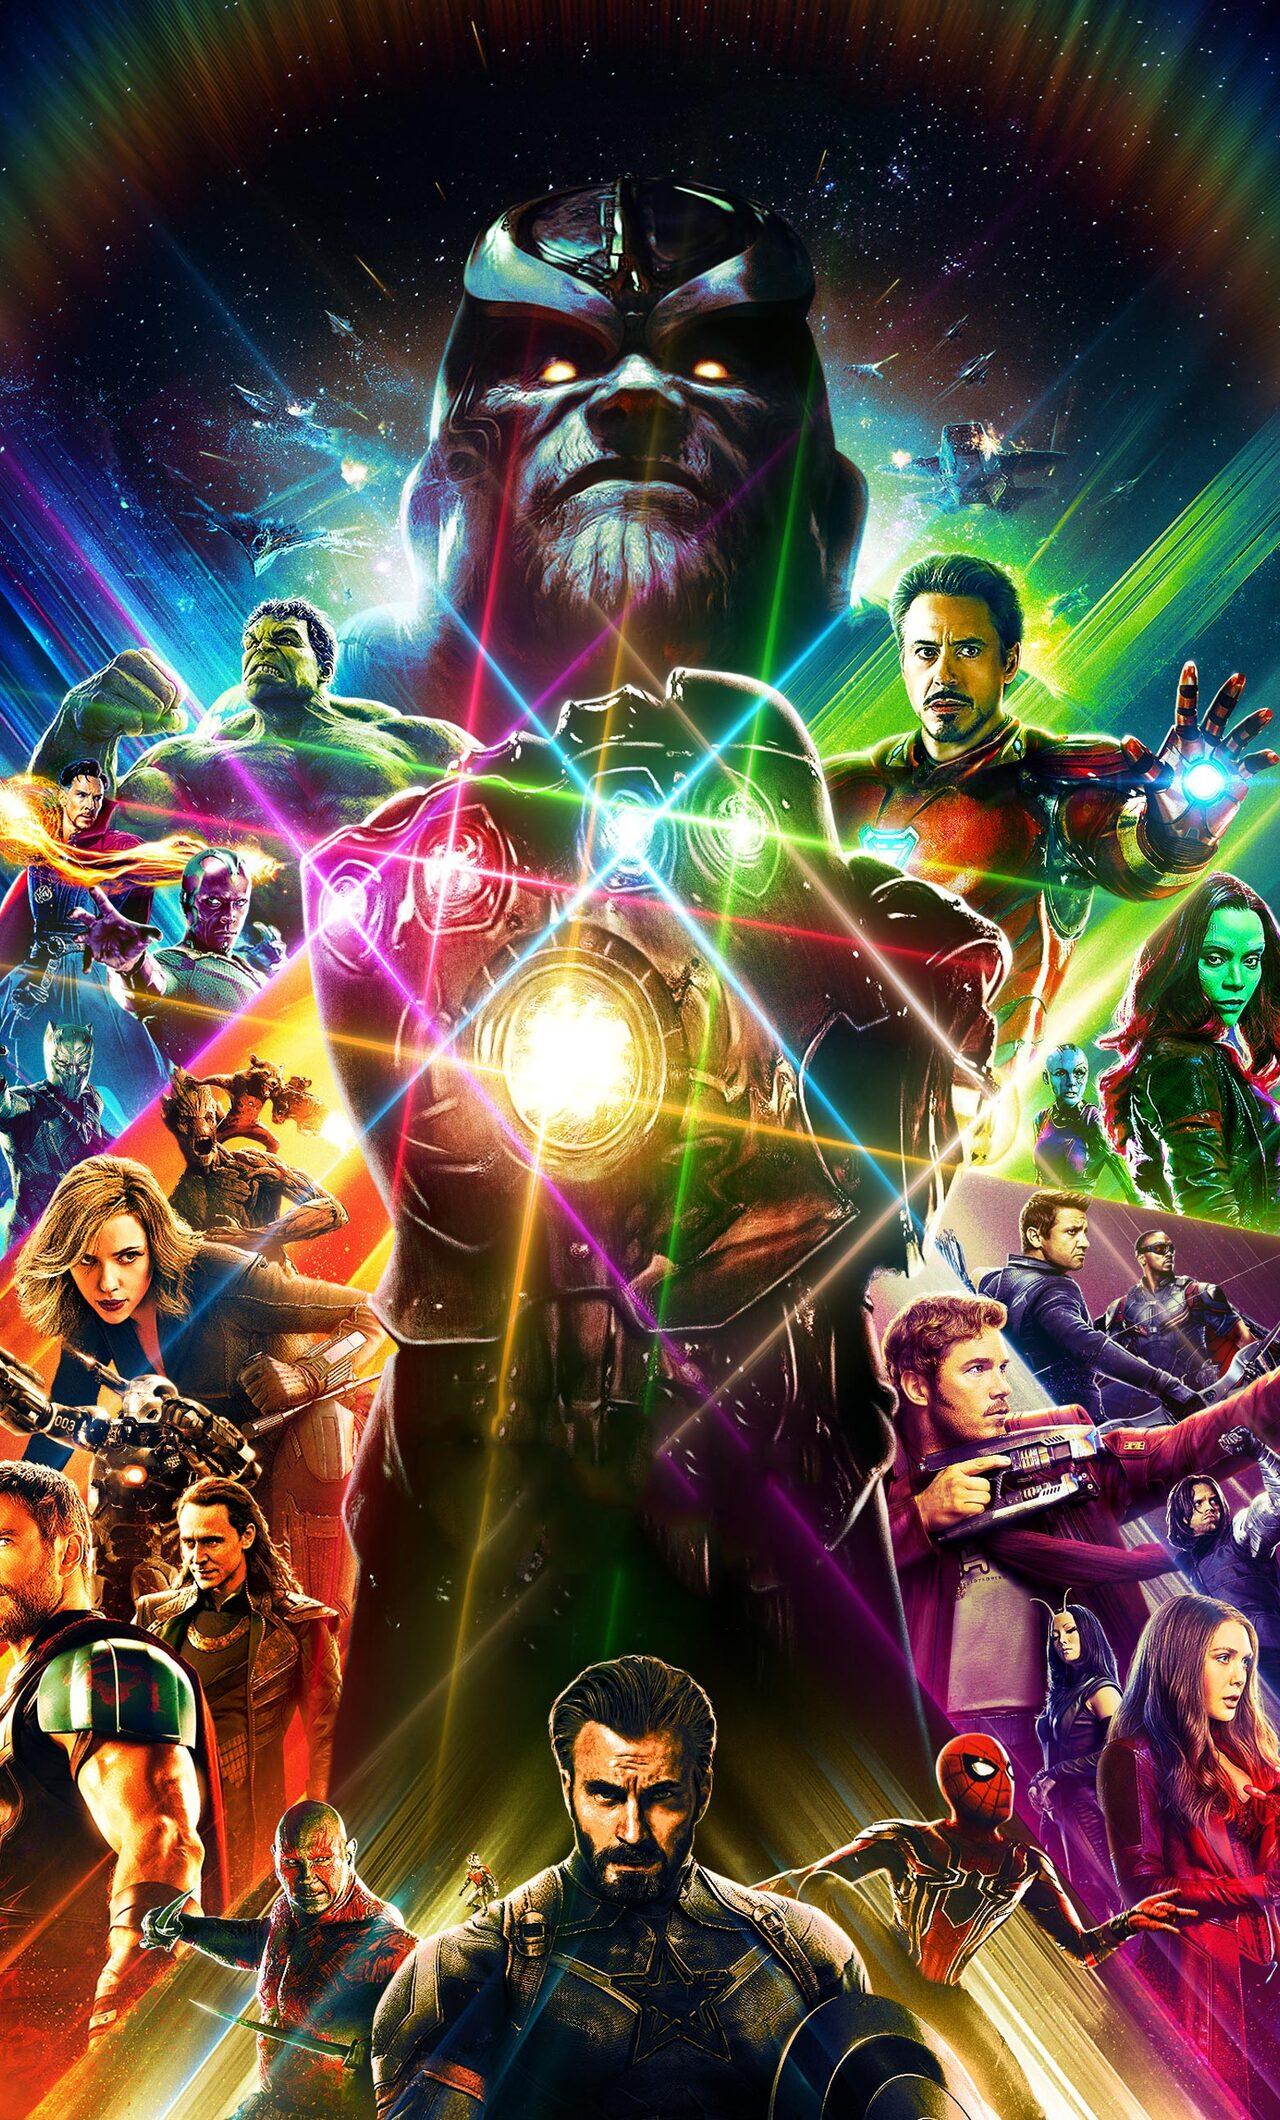 1280x2120 Avengers Infinity War Artwork 2018 Hd Iphone 6 Hd 4k